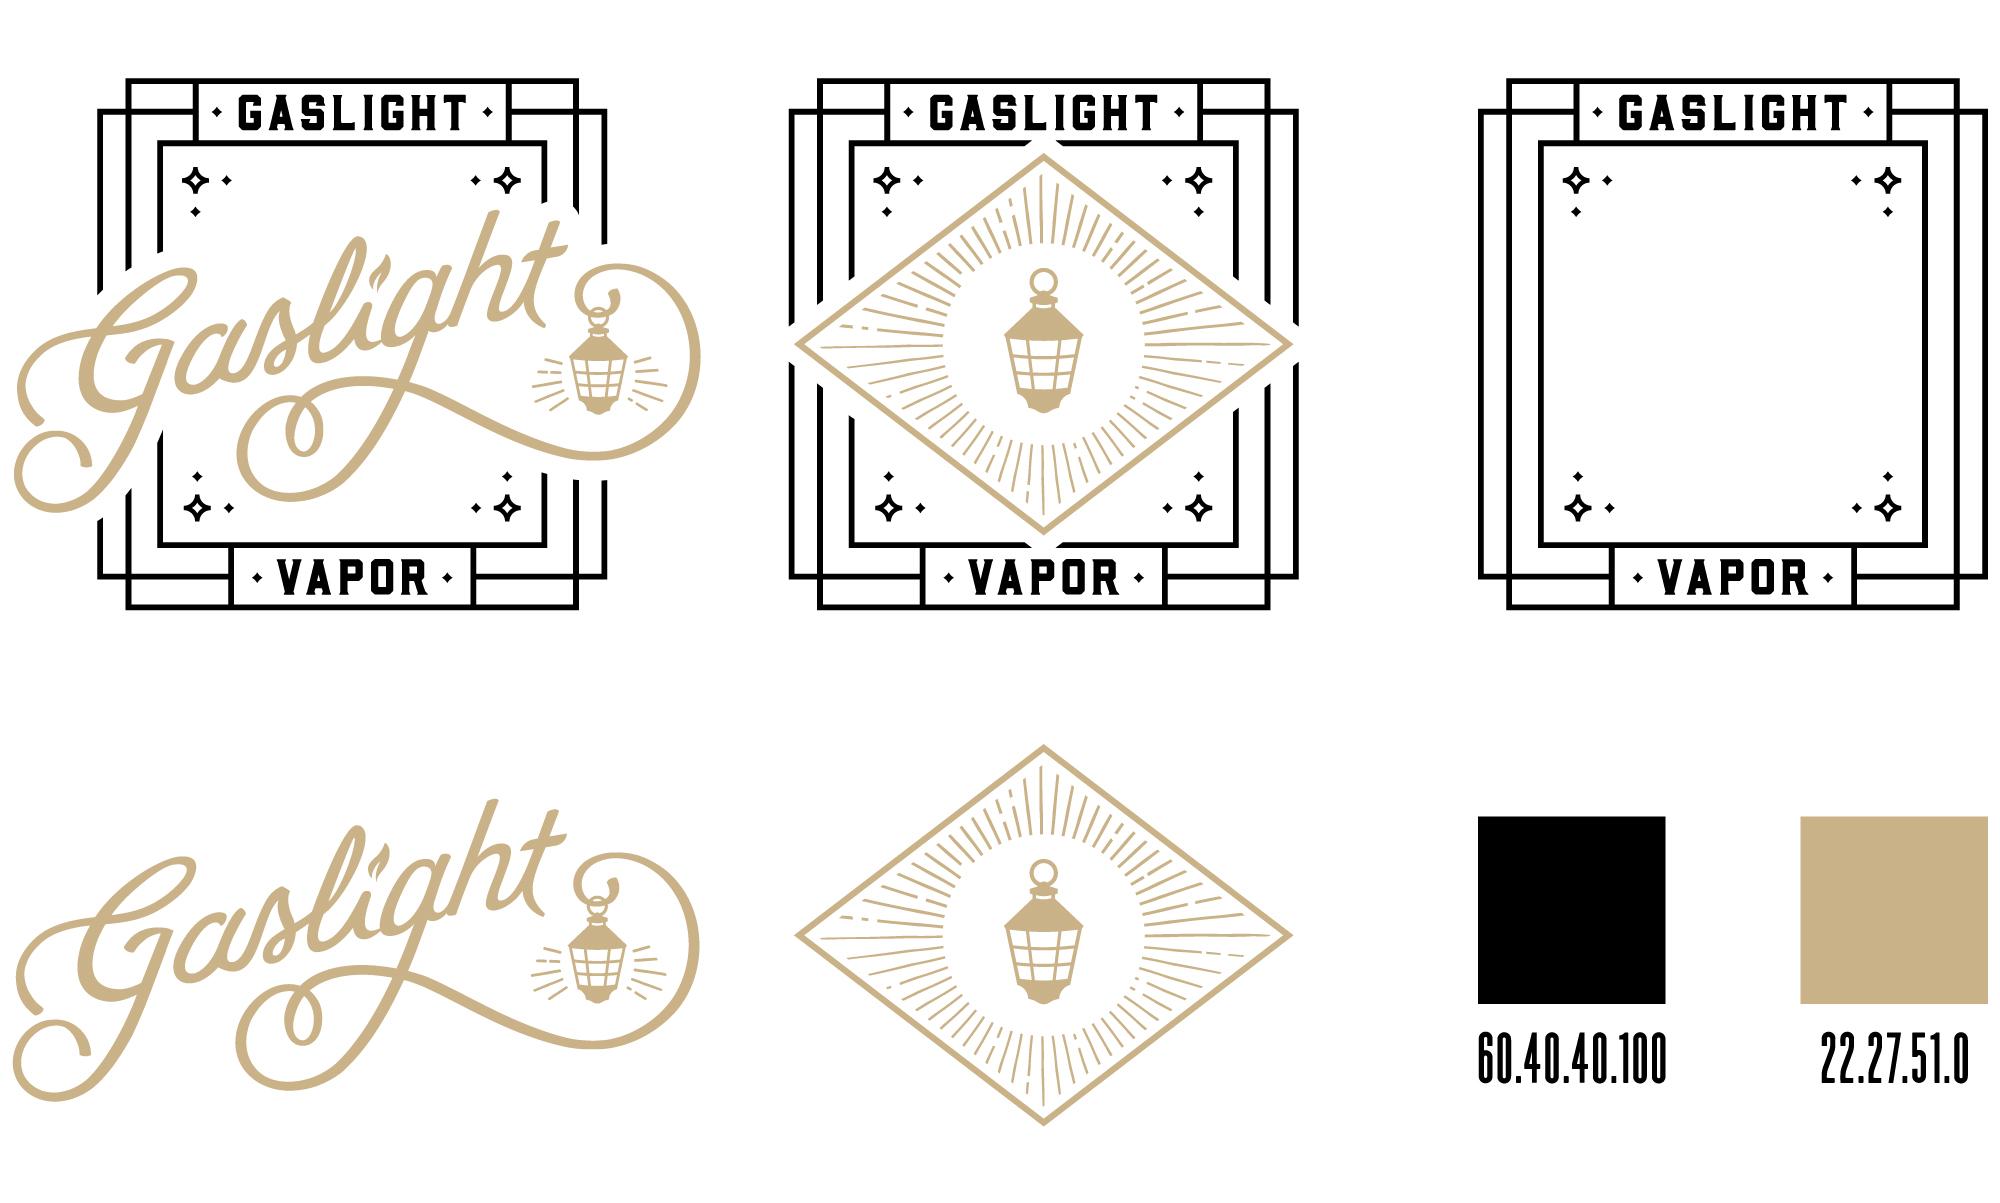 Gaslight Short Brand Guide